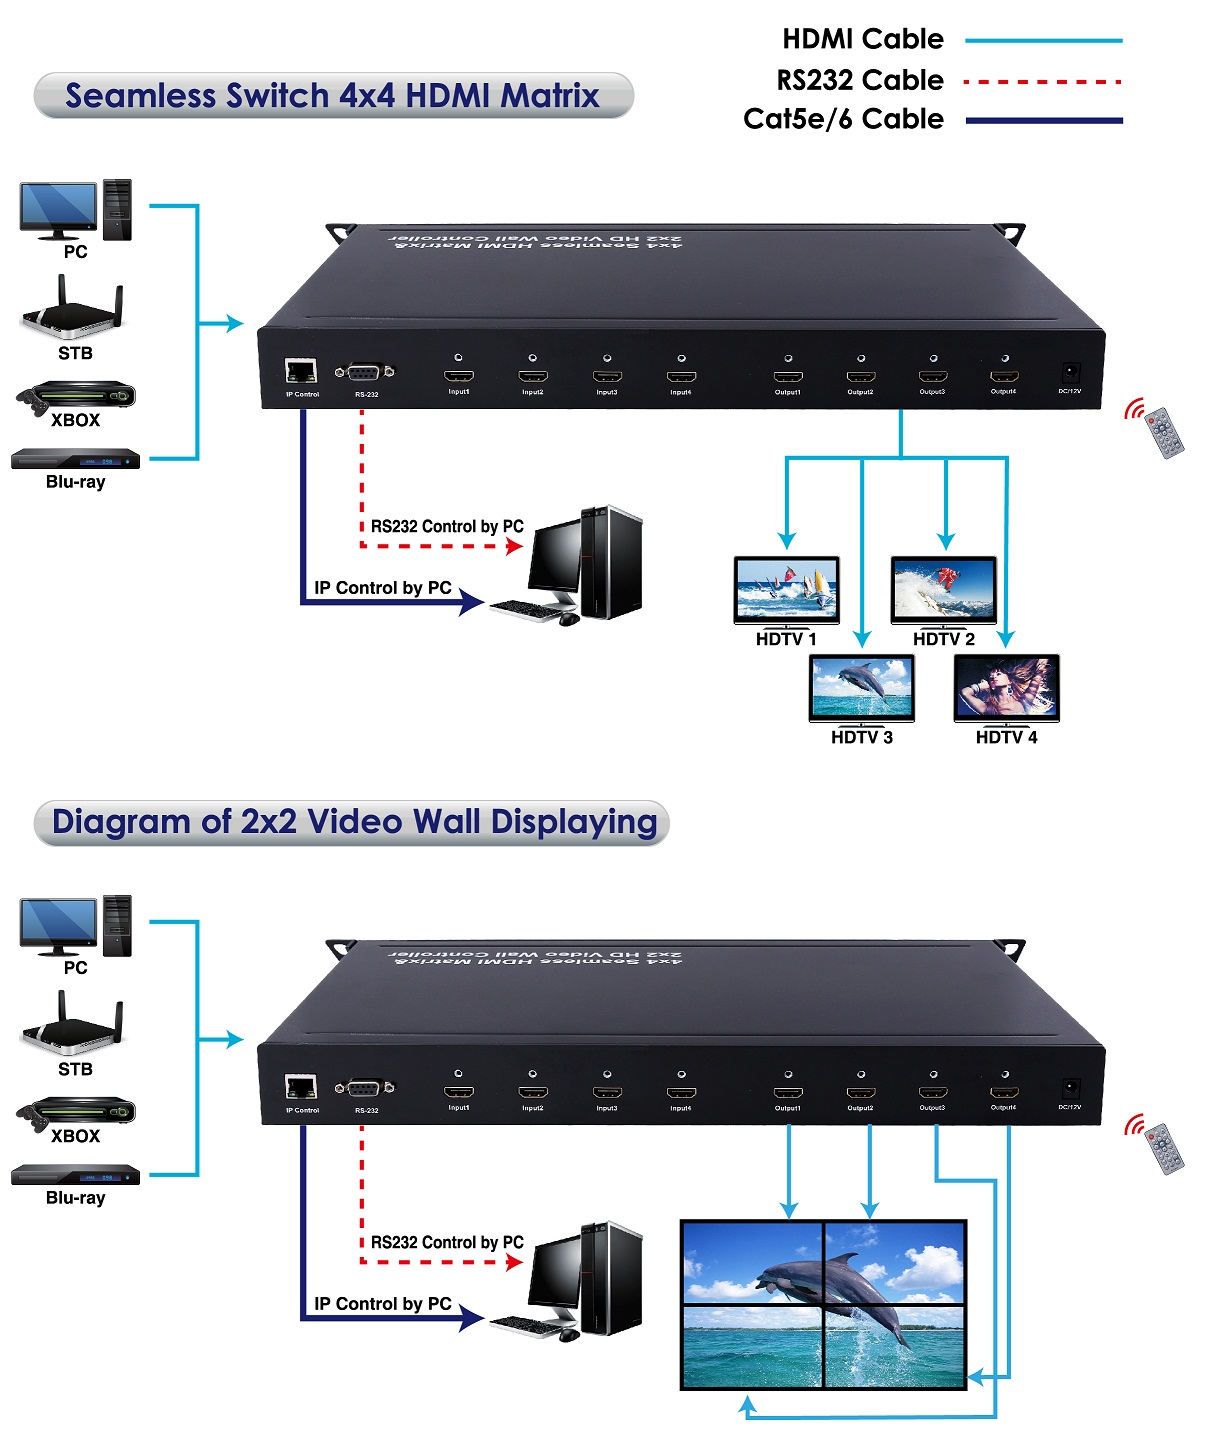 4X4 Seamless HDMI Matrix & 2x2 Video Wall Controller _